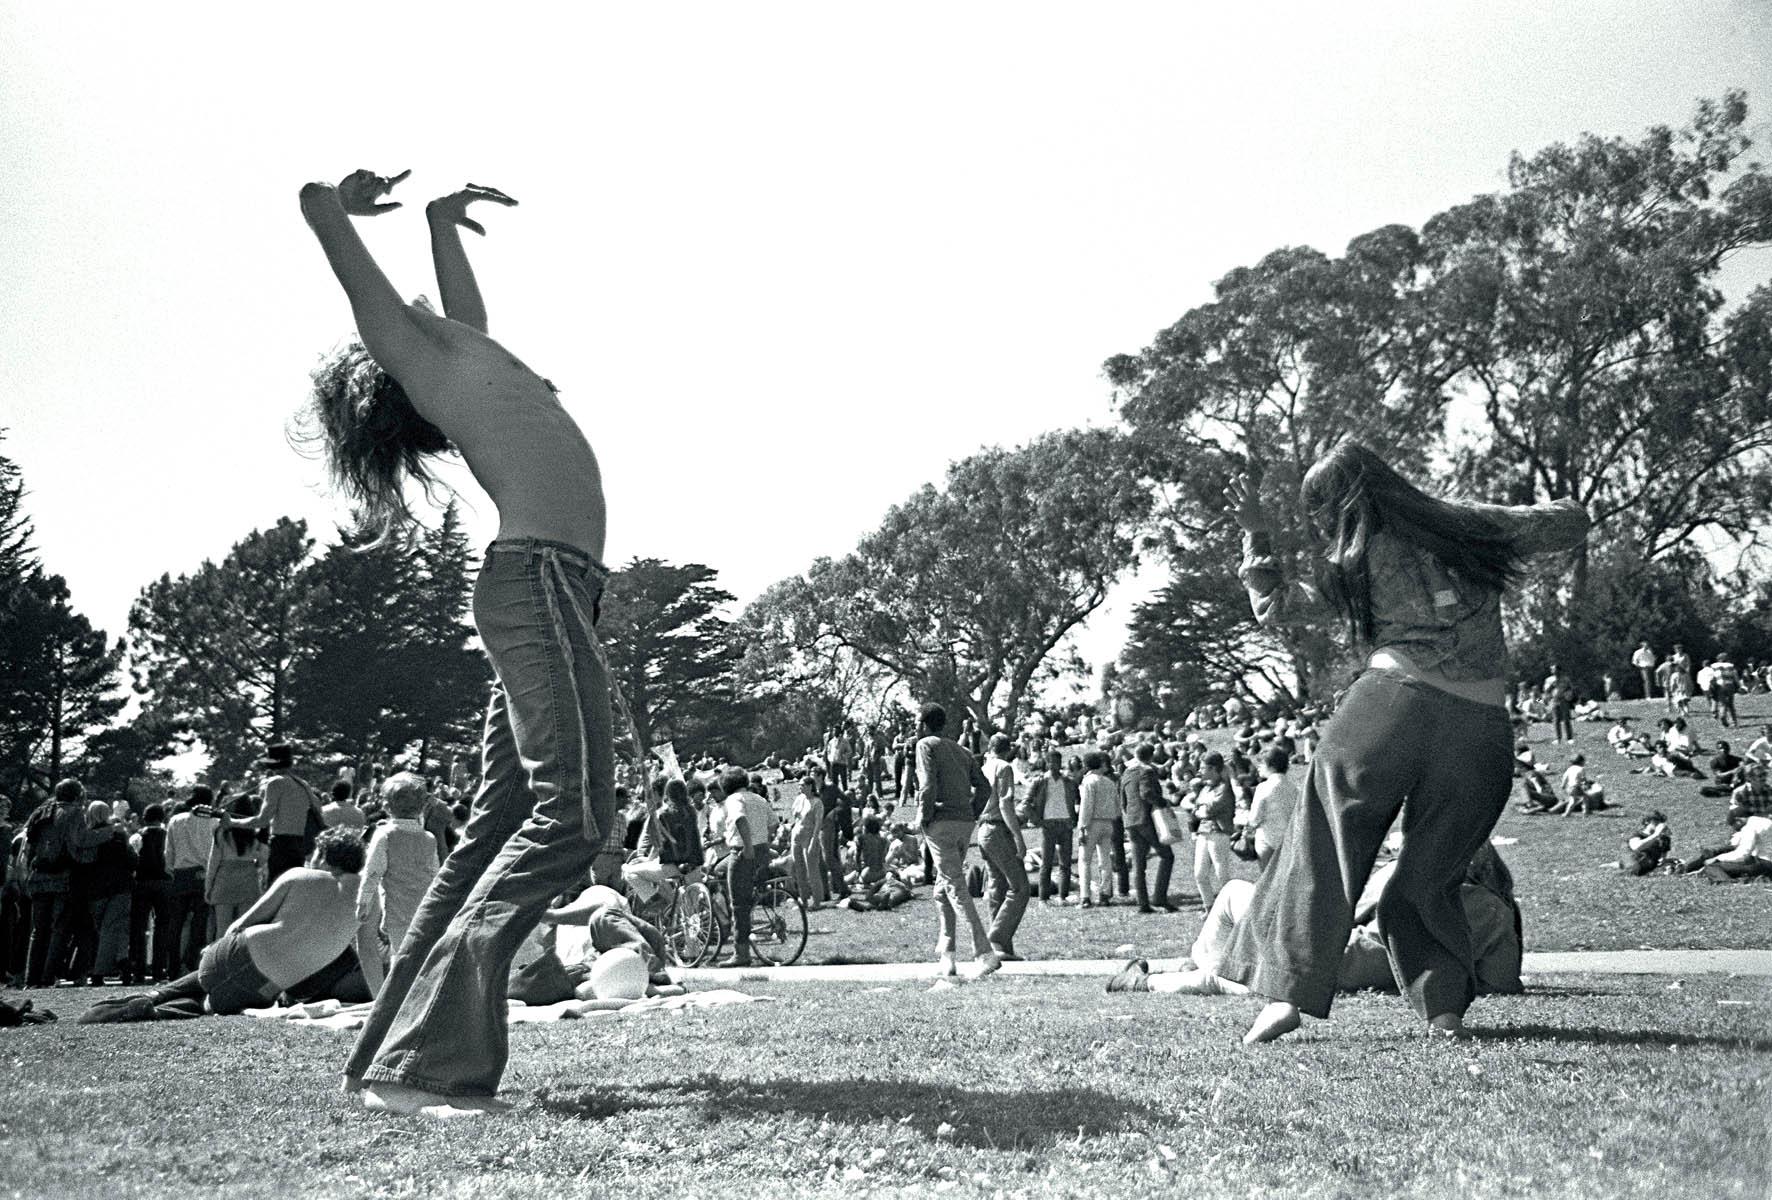 Hippy Vintage 67